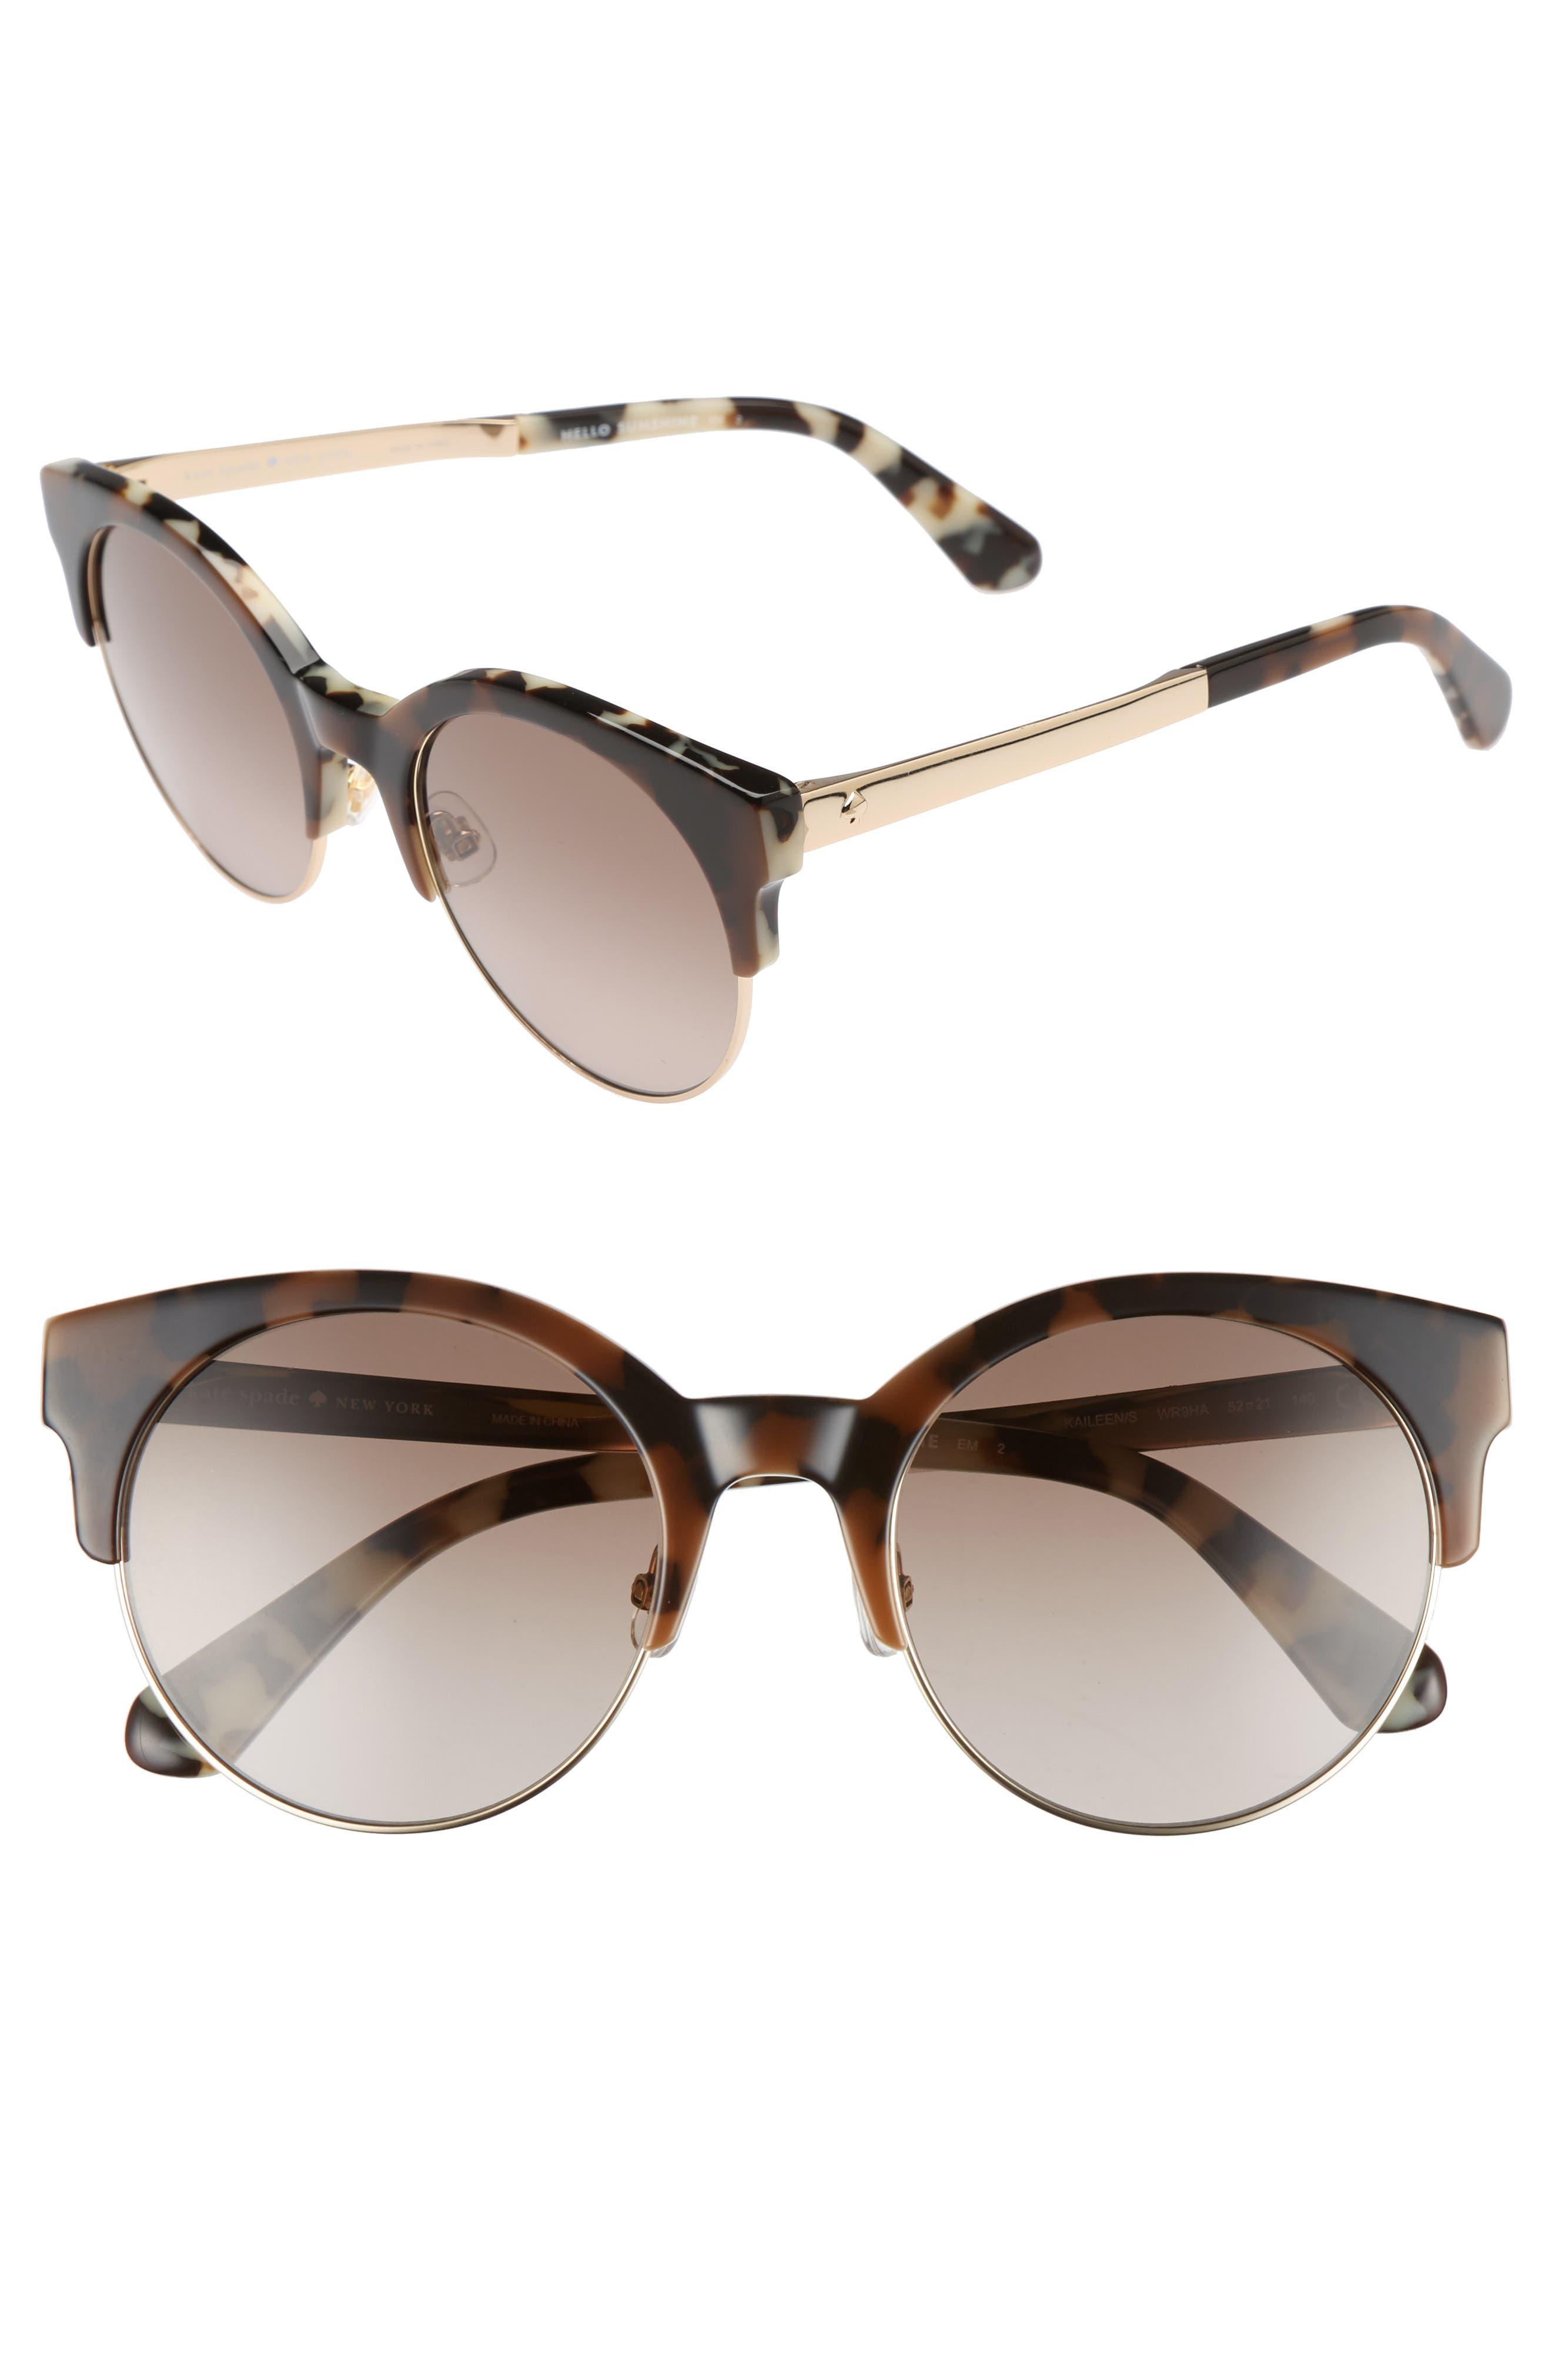 Main Image - kate spade new york kaileen 52mm semi-rimless cat eye sunglasses